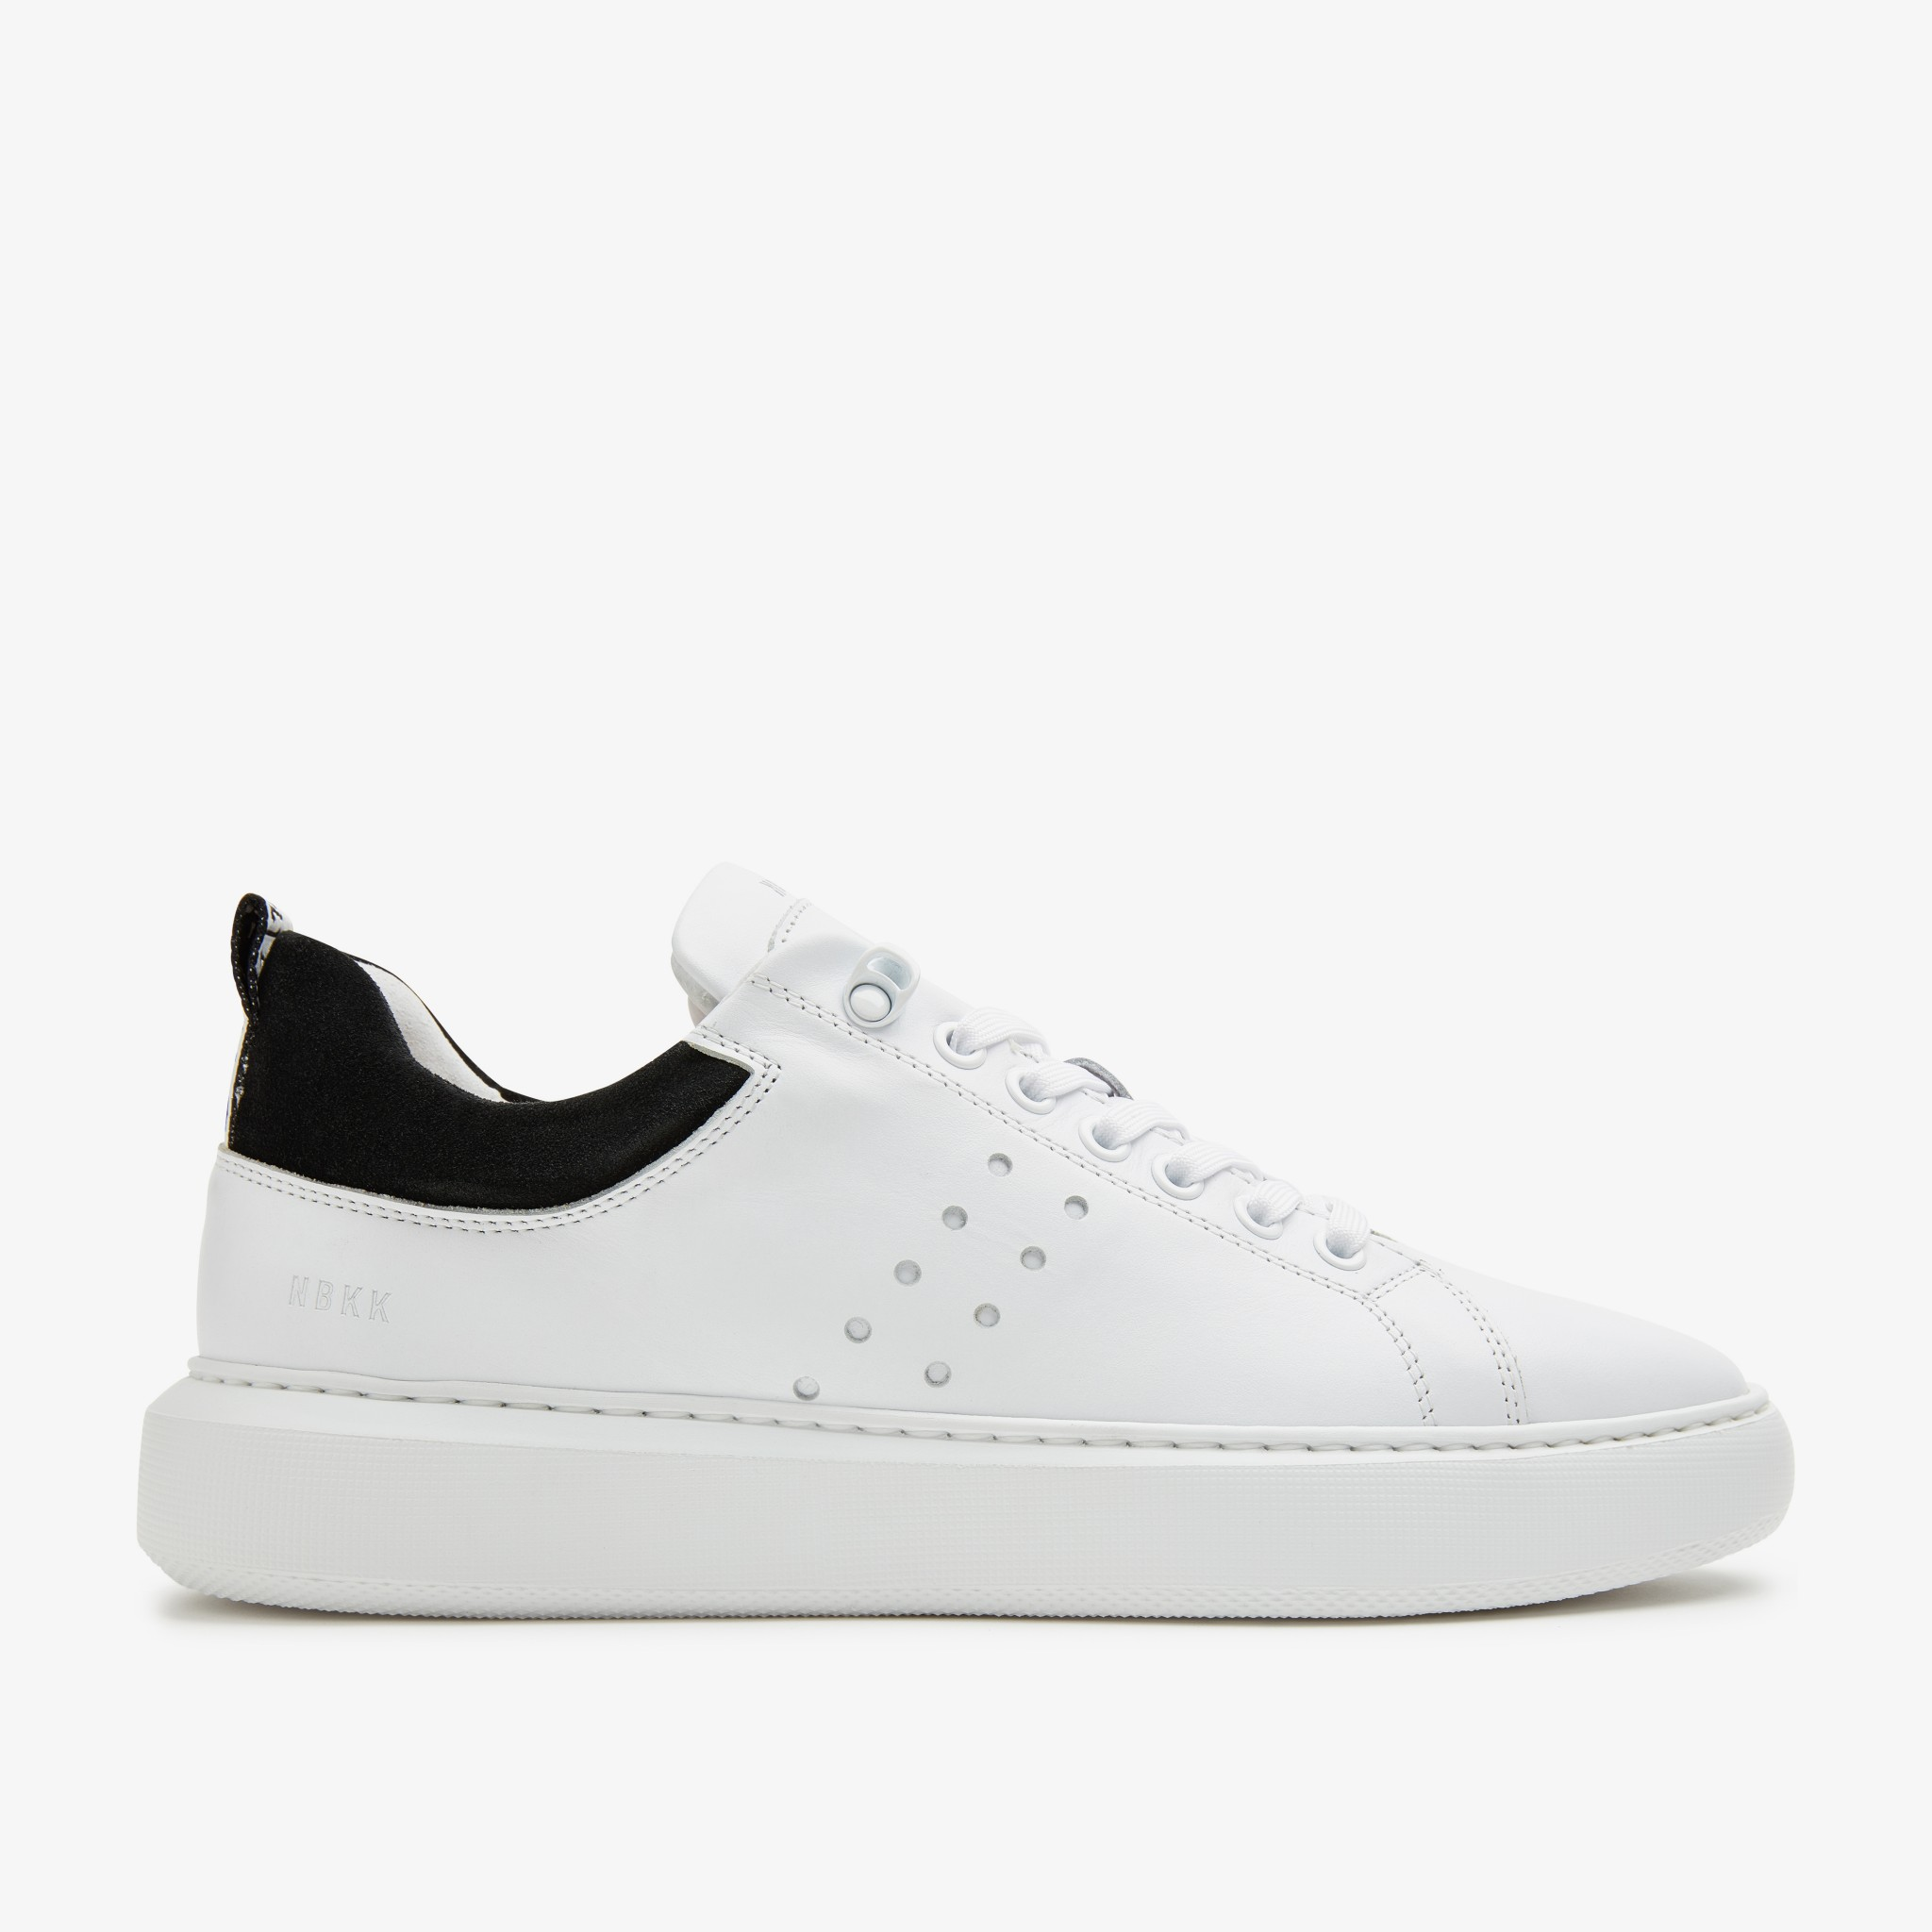 57e9ccdaa0a Scott Calf | Witte Sneaker